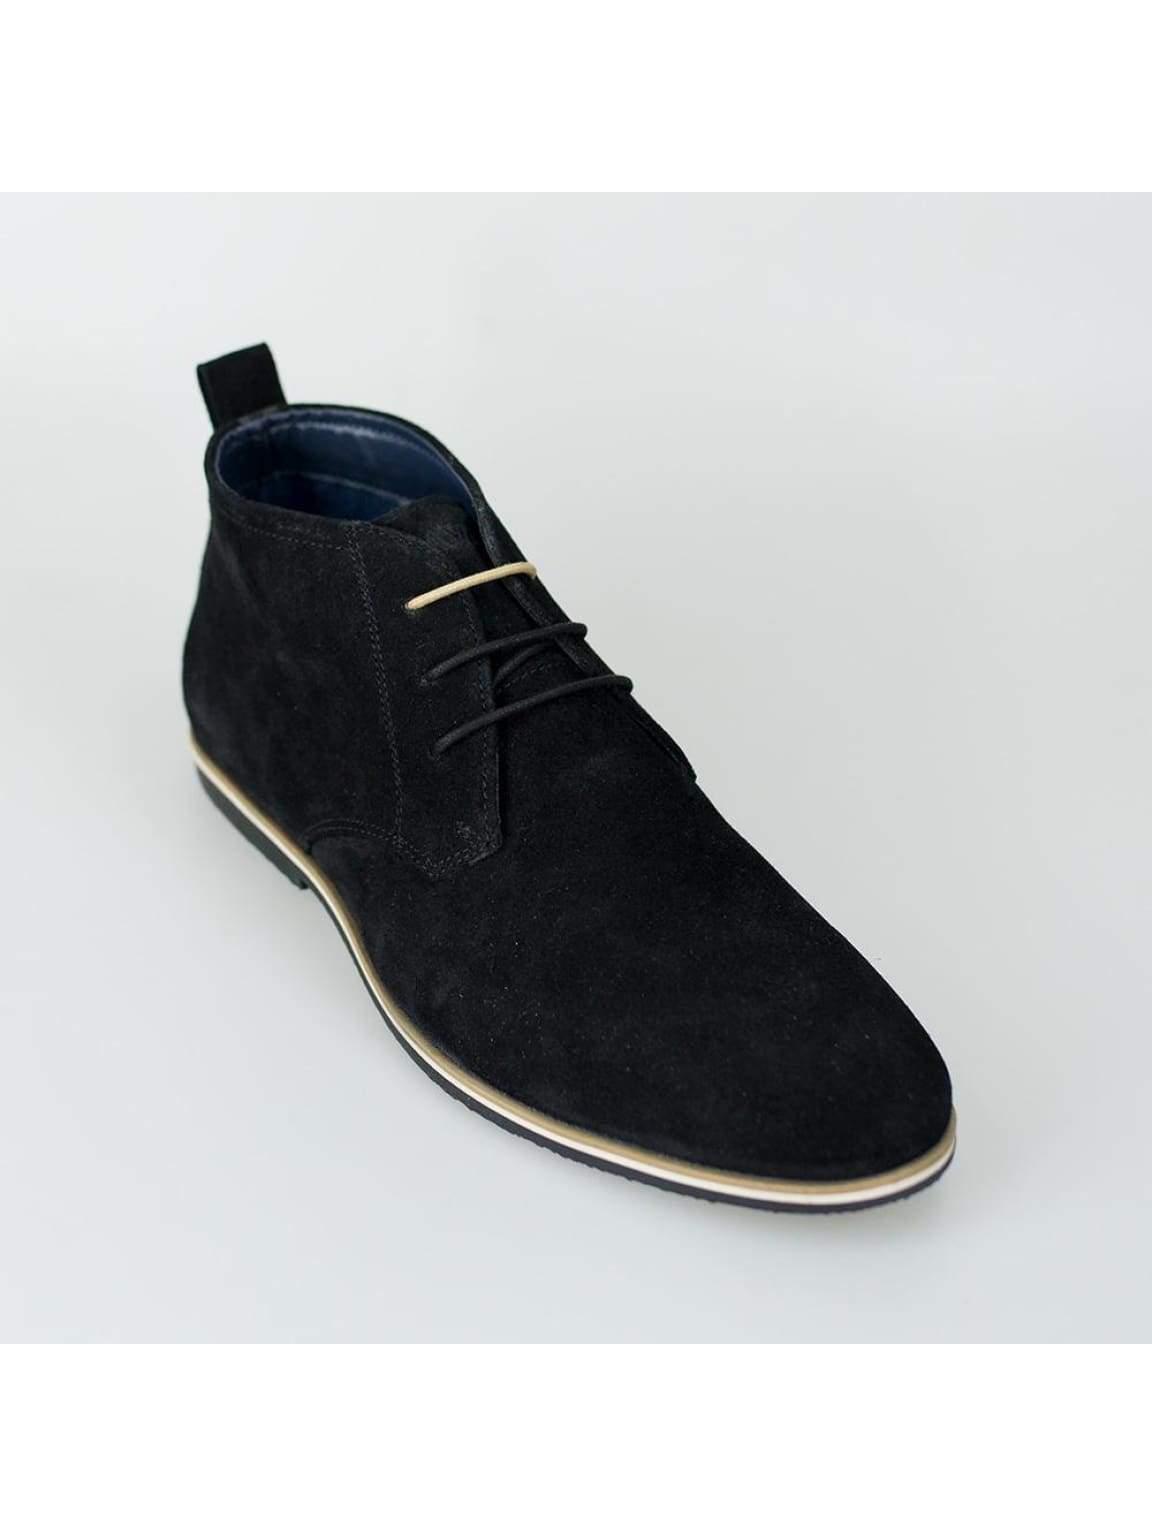 Cavani Desert Mens Black Suede Boots - Boots